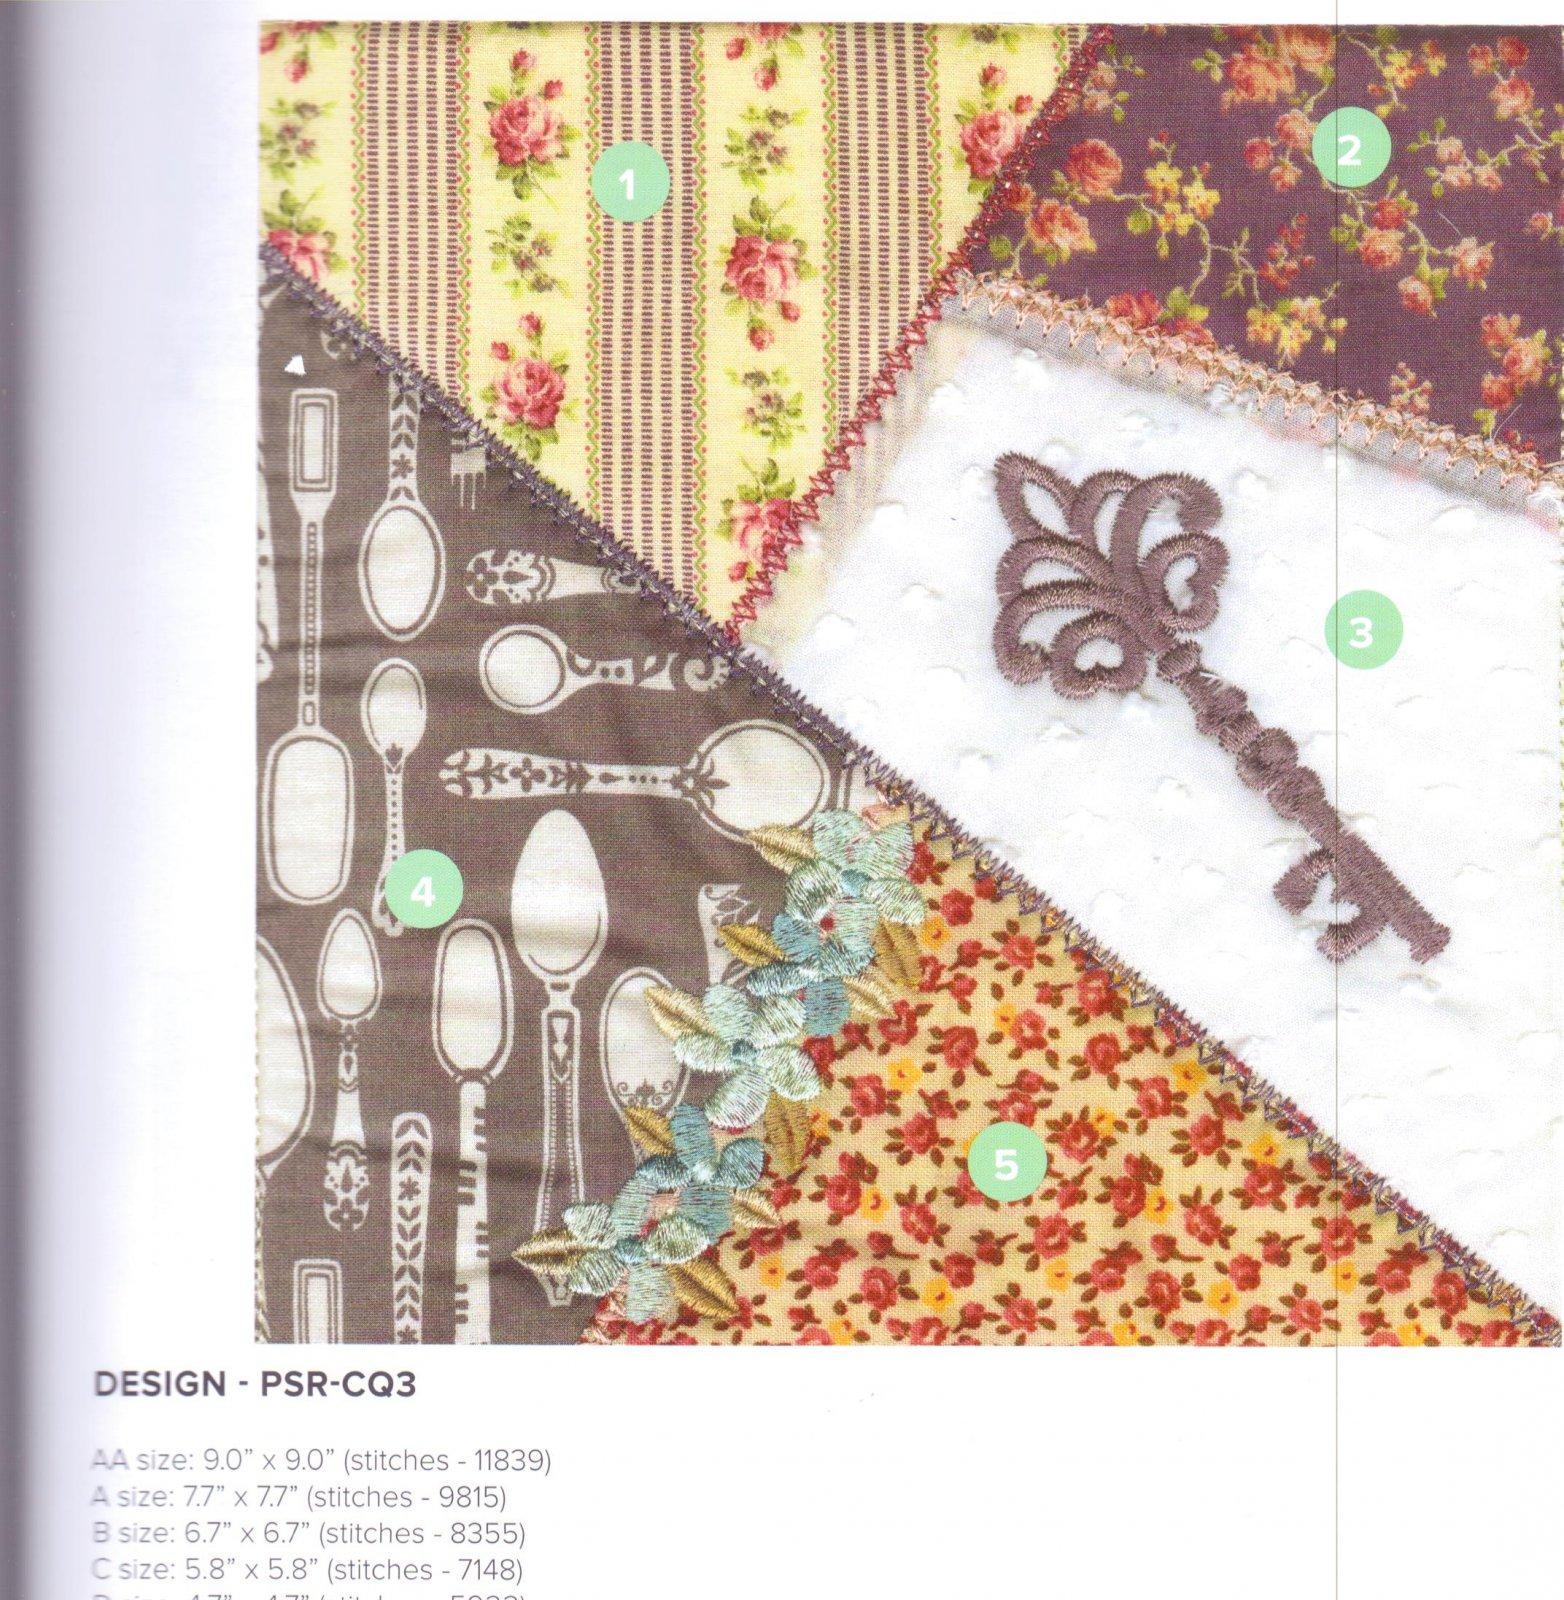 Crazy Quilt Blocks From Anita Goodesign